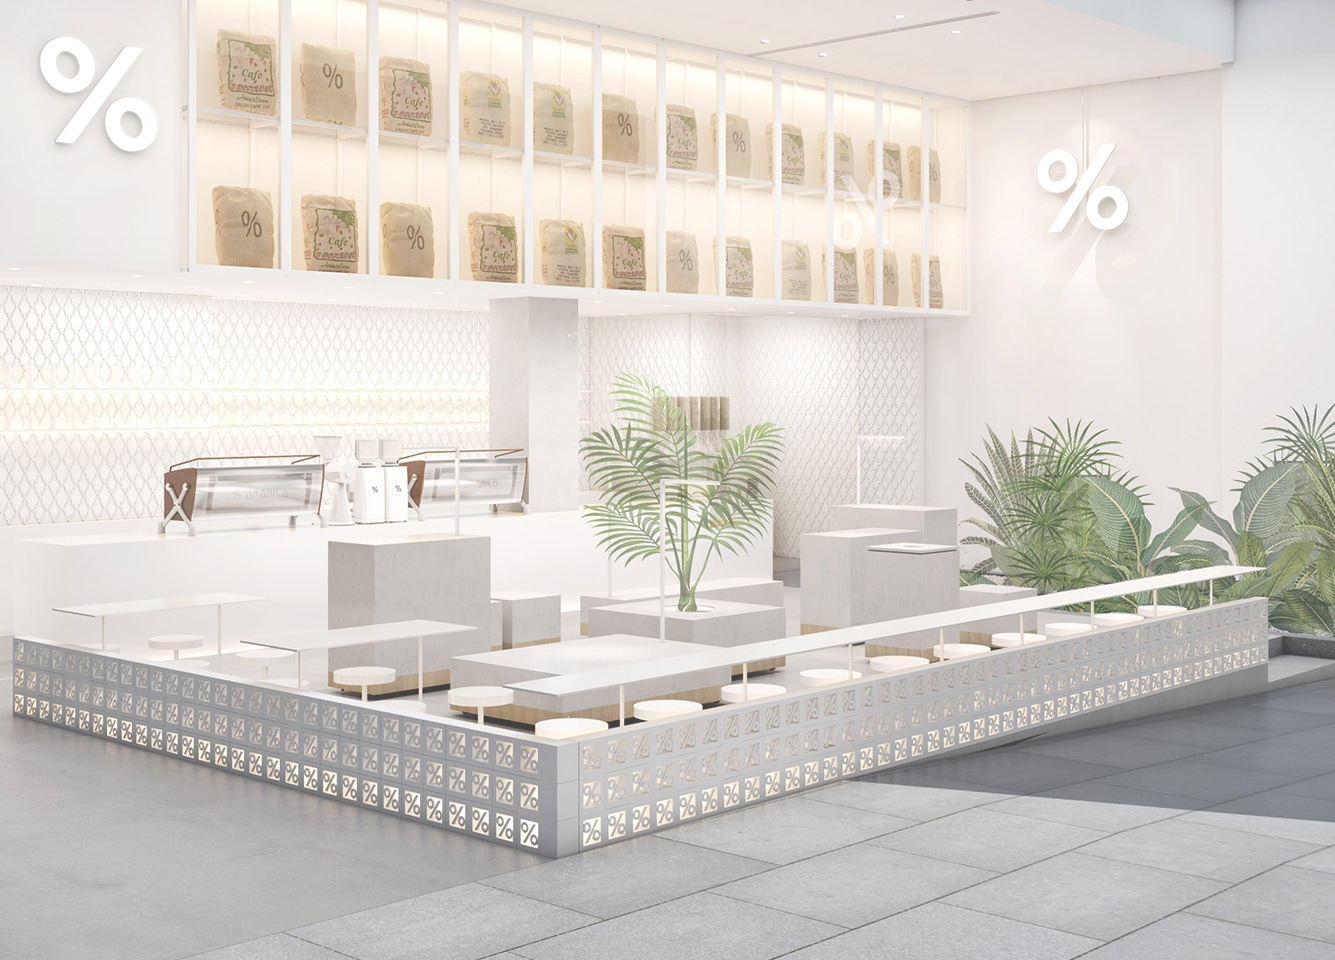 New Restaurants Singapore 2019